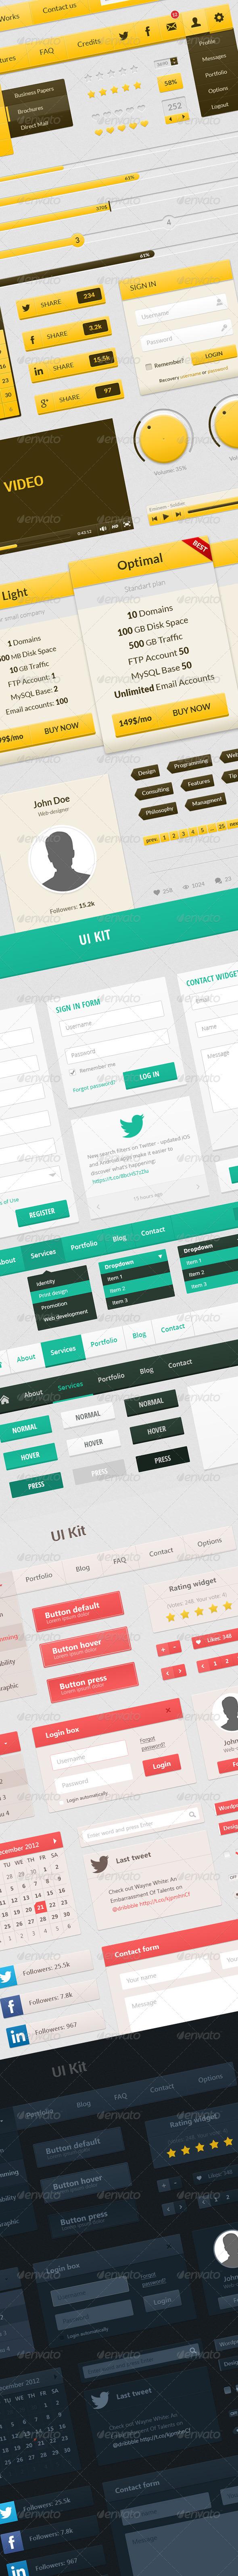 UI Web Elements Pack - User Interfaces Web Elements